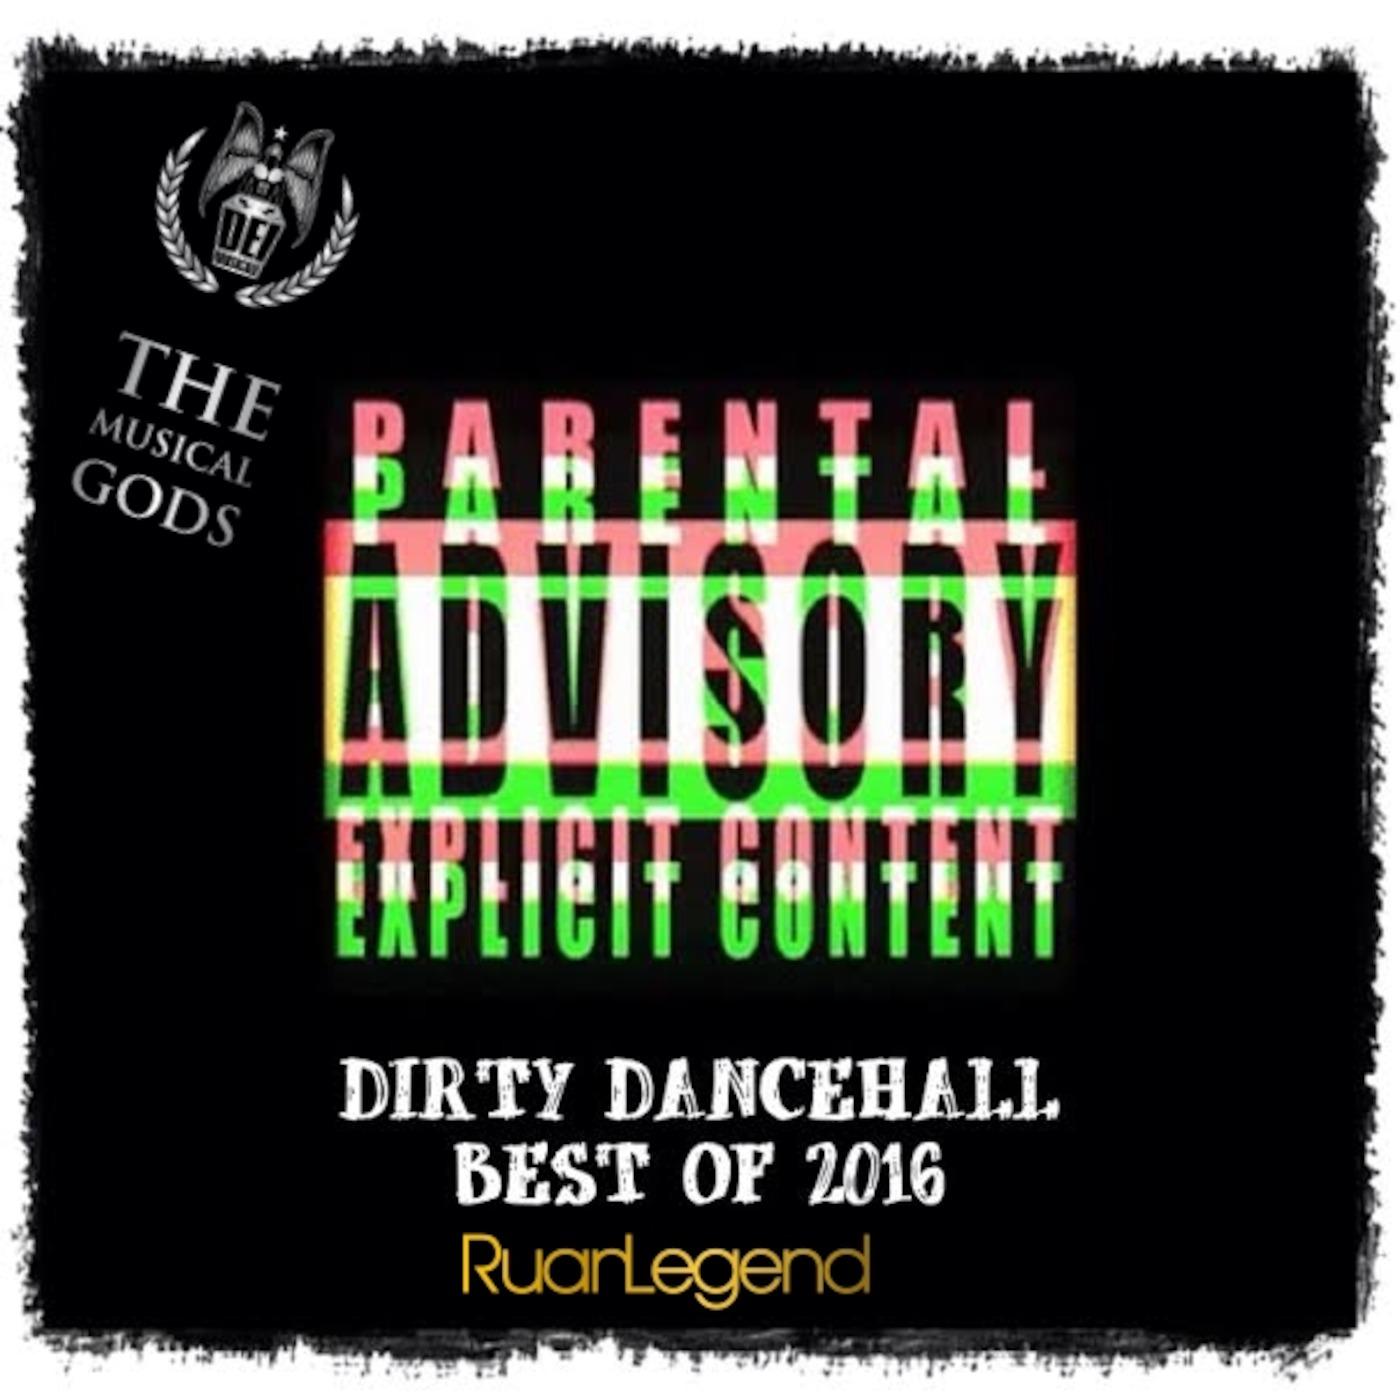 Best Of 2016 : DIRTY Dancehall Ruan Legend's podcast